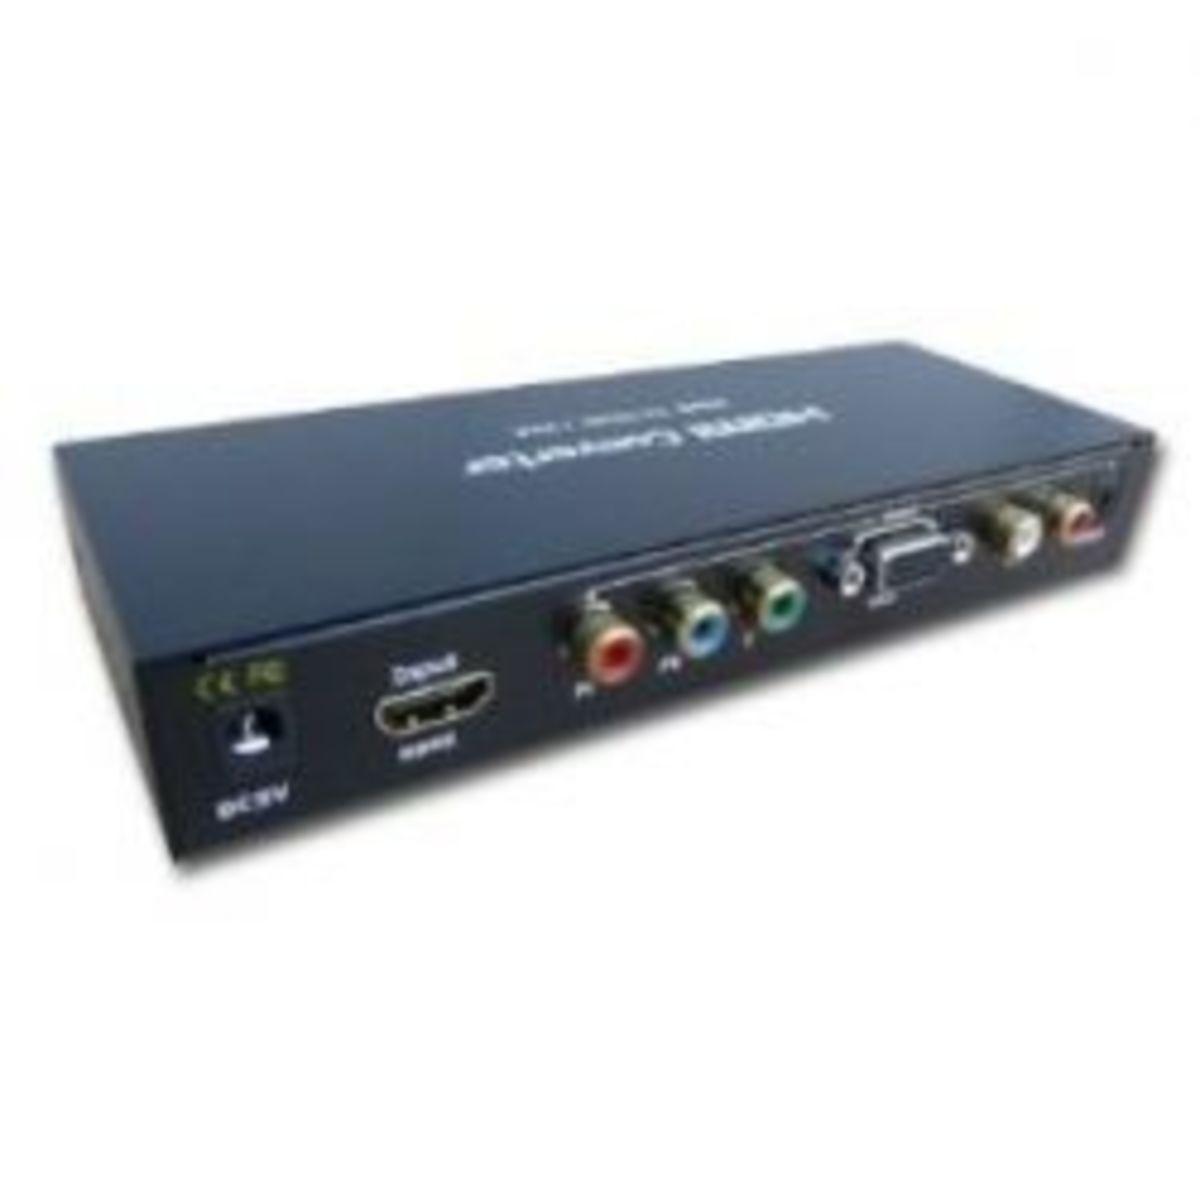 HDCP HDMI to VGA + SPDIF RGB Component Ypbpr Converter v1.3b